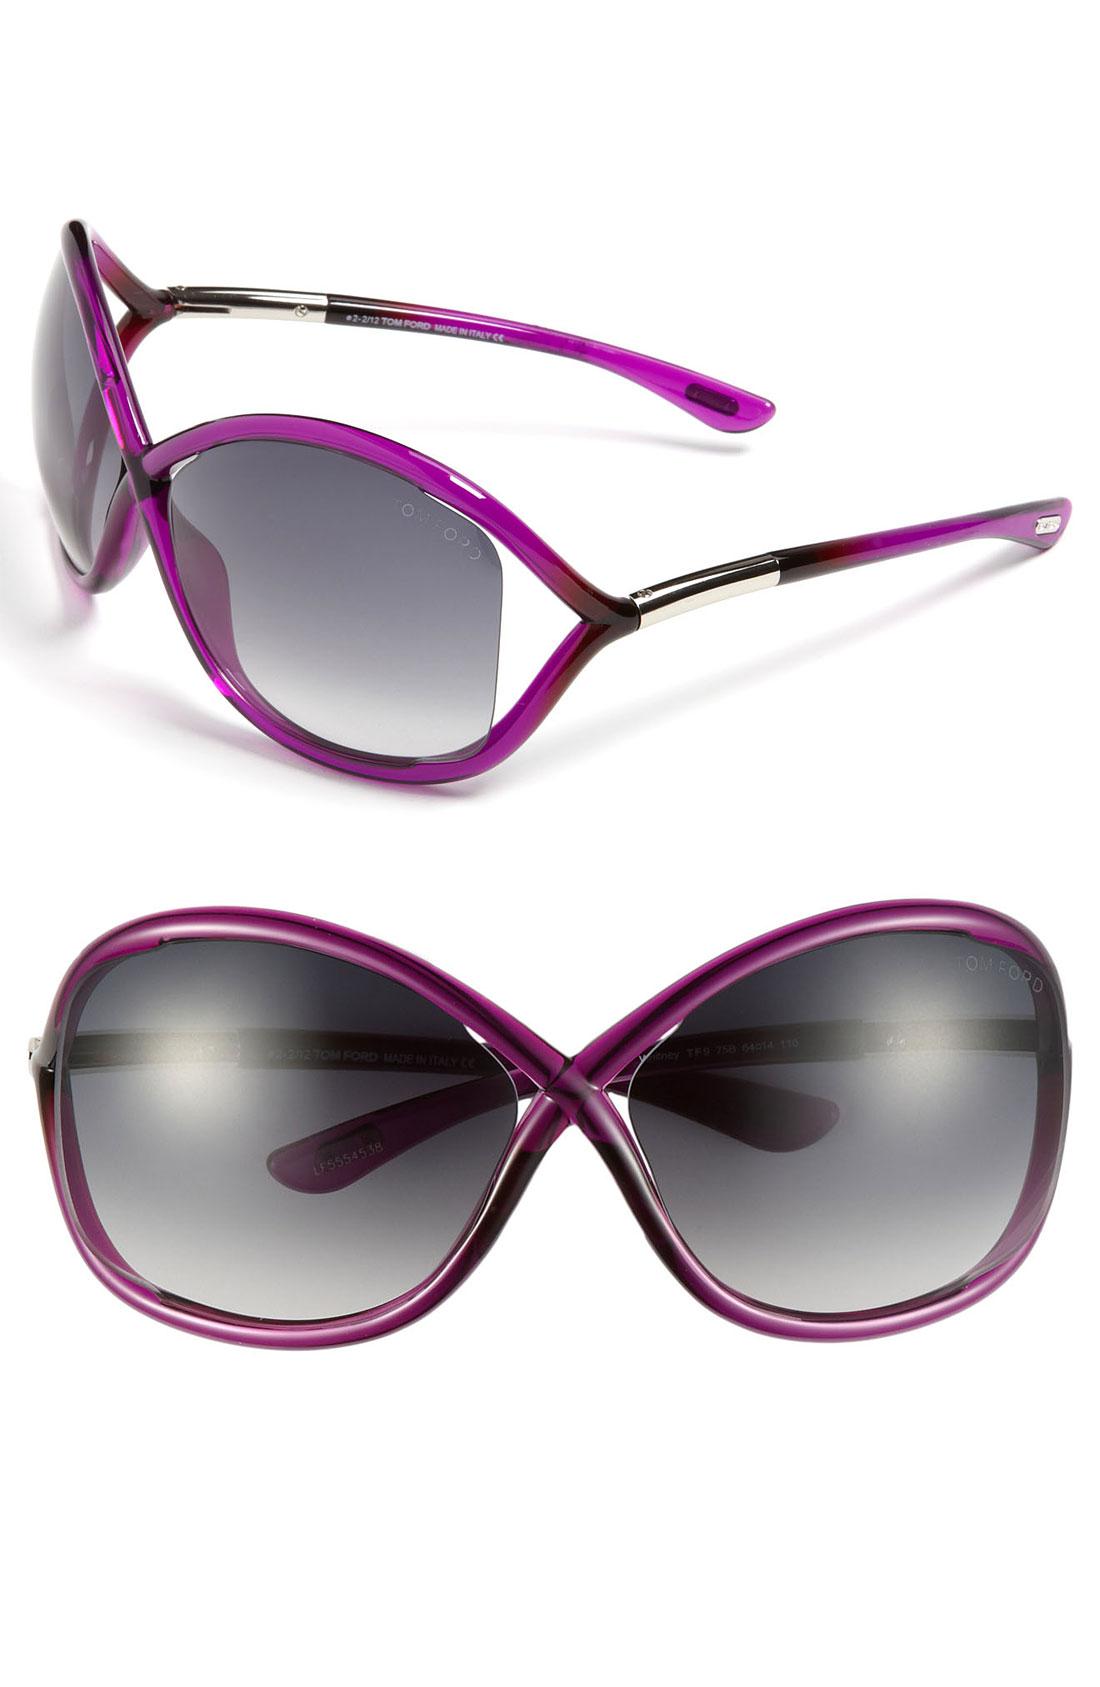 Purple Aviators Sunglasses Louisiana Bucket Brigade